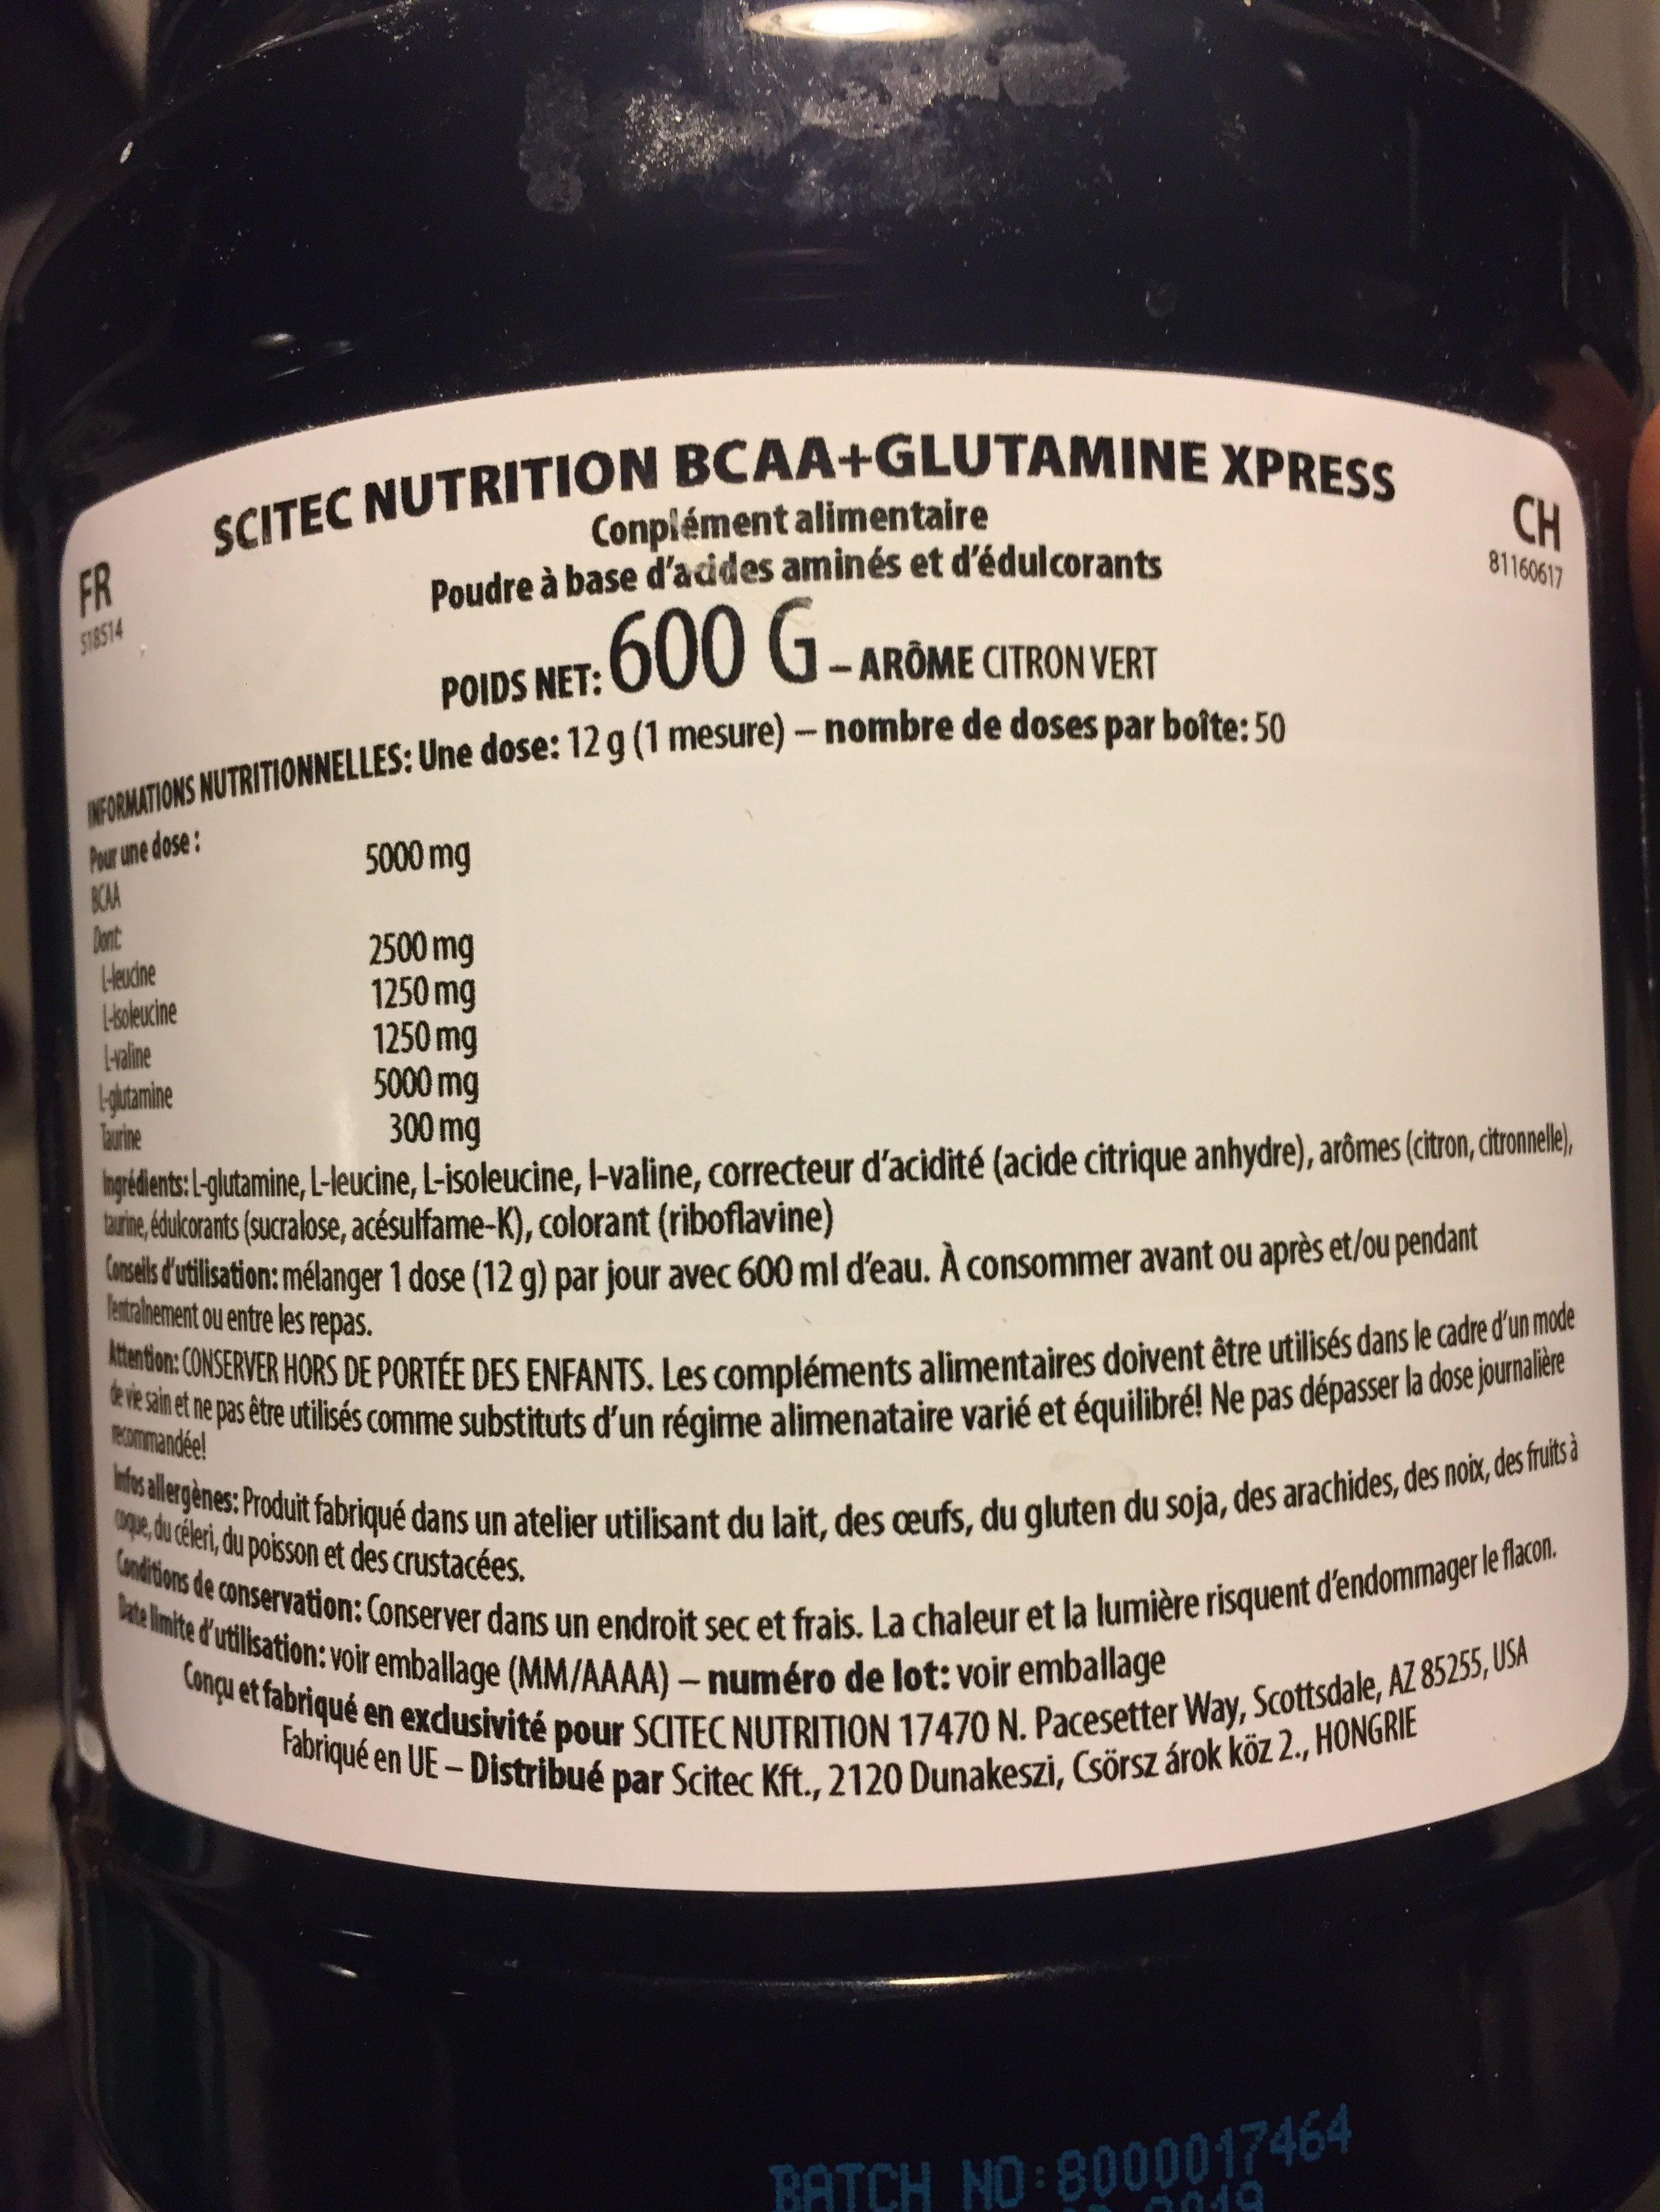 Scitec Nutrition Bcaa + Glutamin Xpress 600G Merken - Ingredients - fr